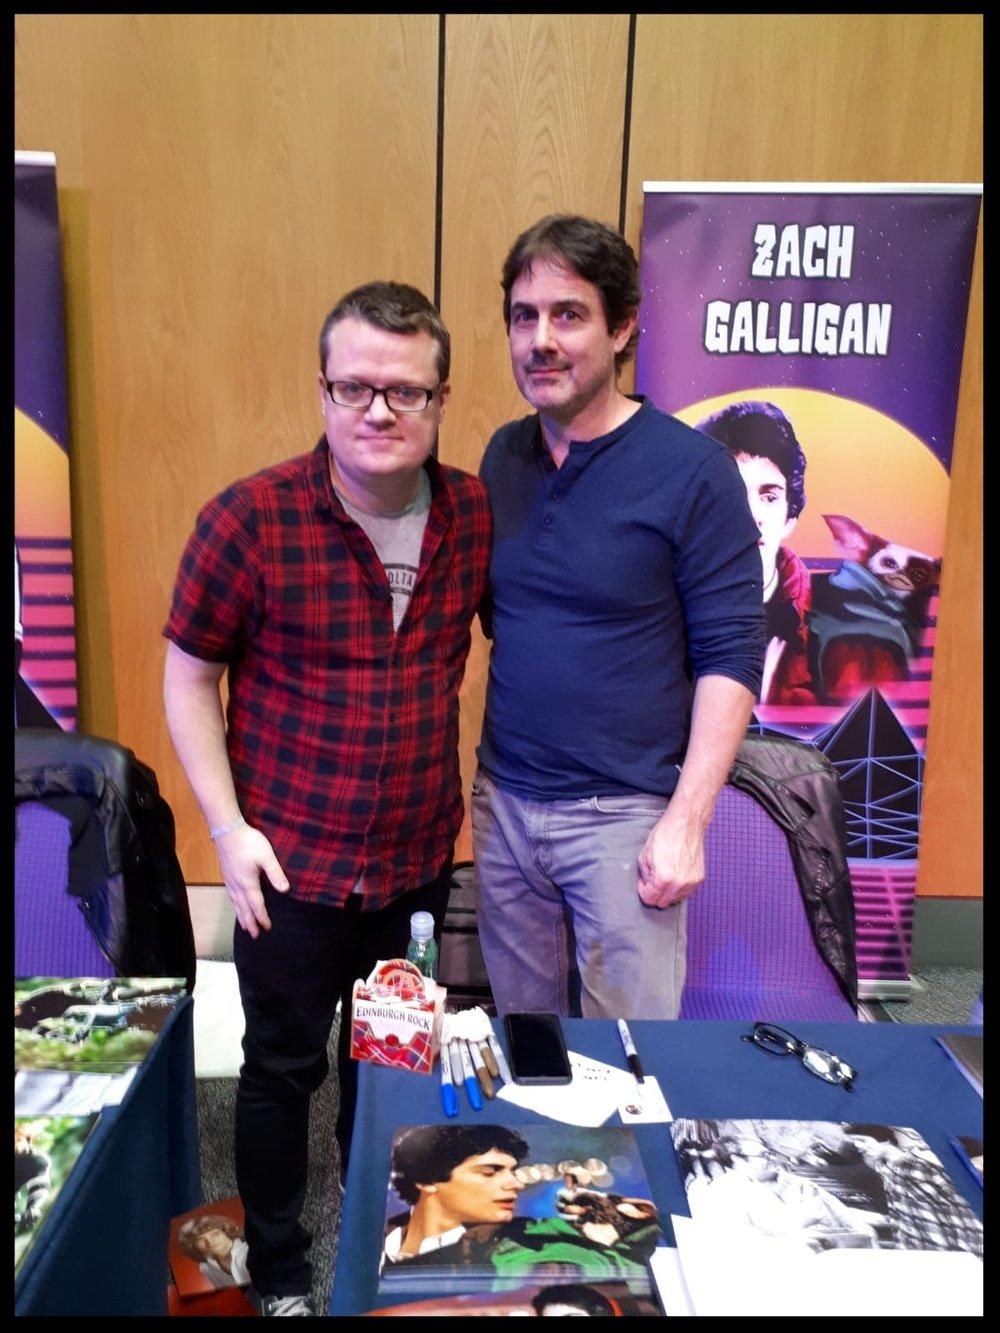 Aaron and Zach Galligan